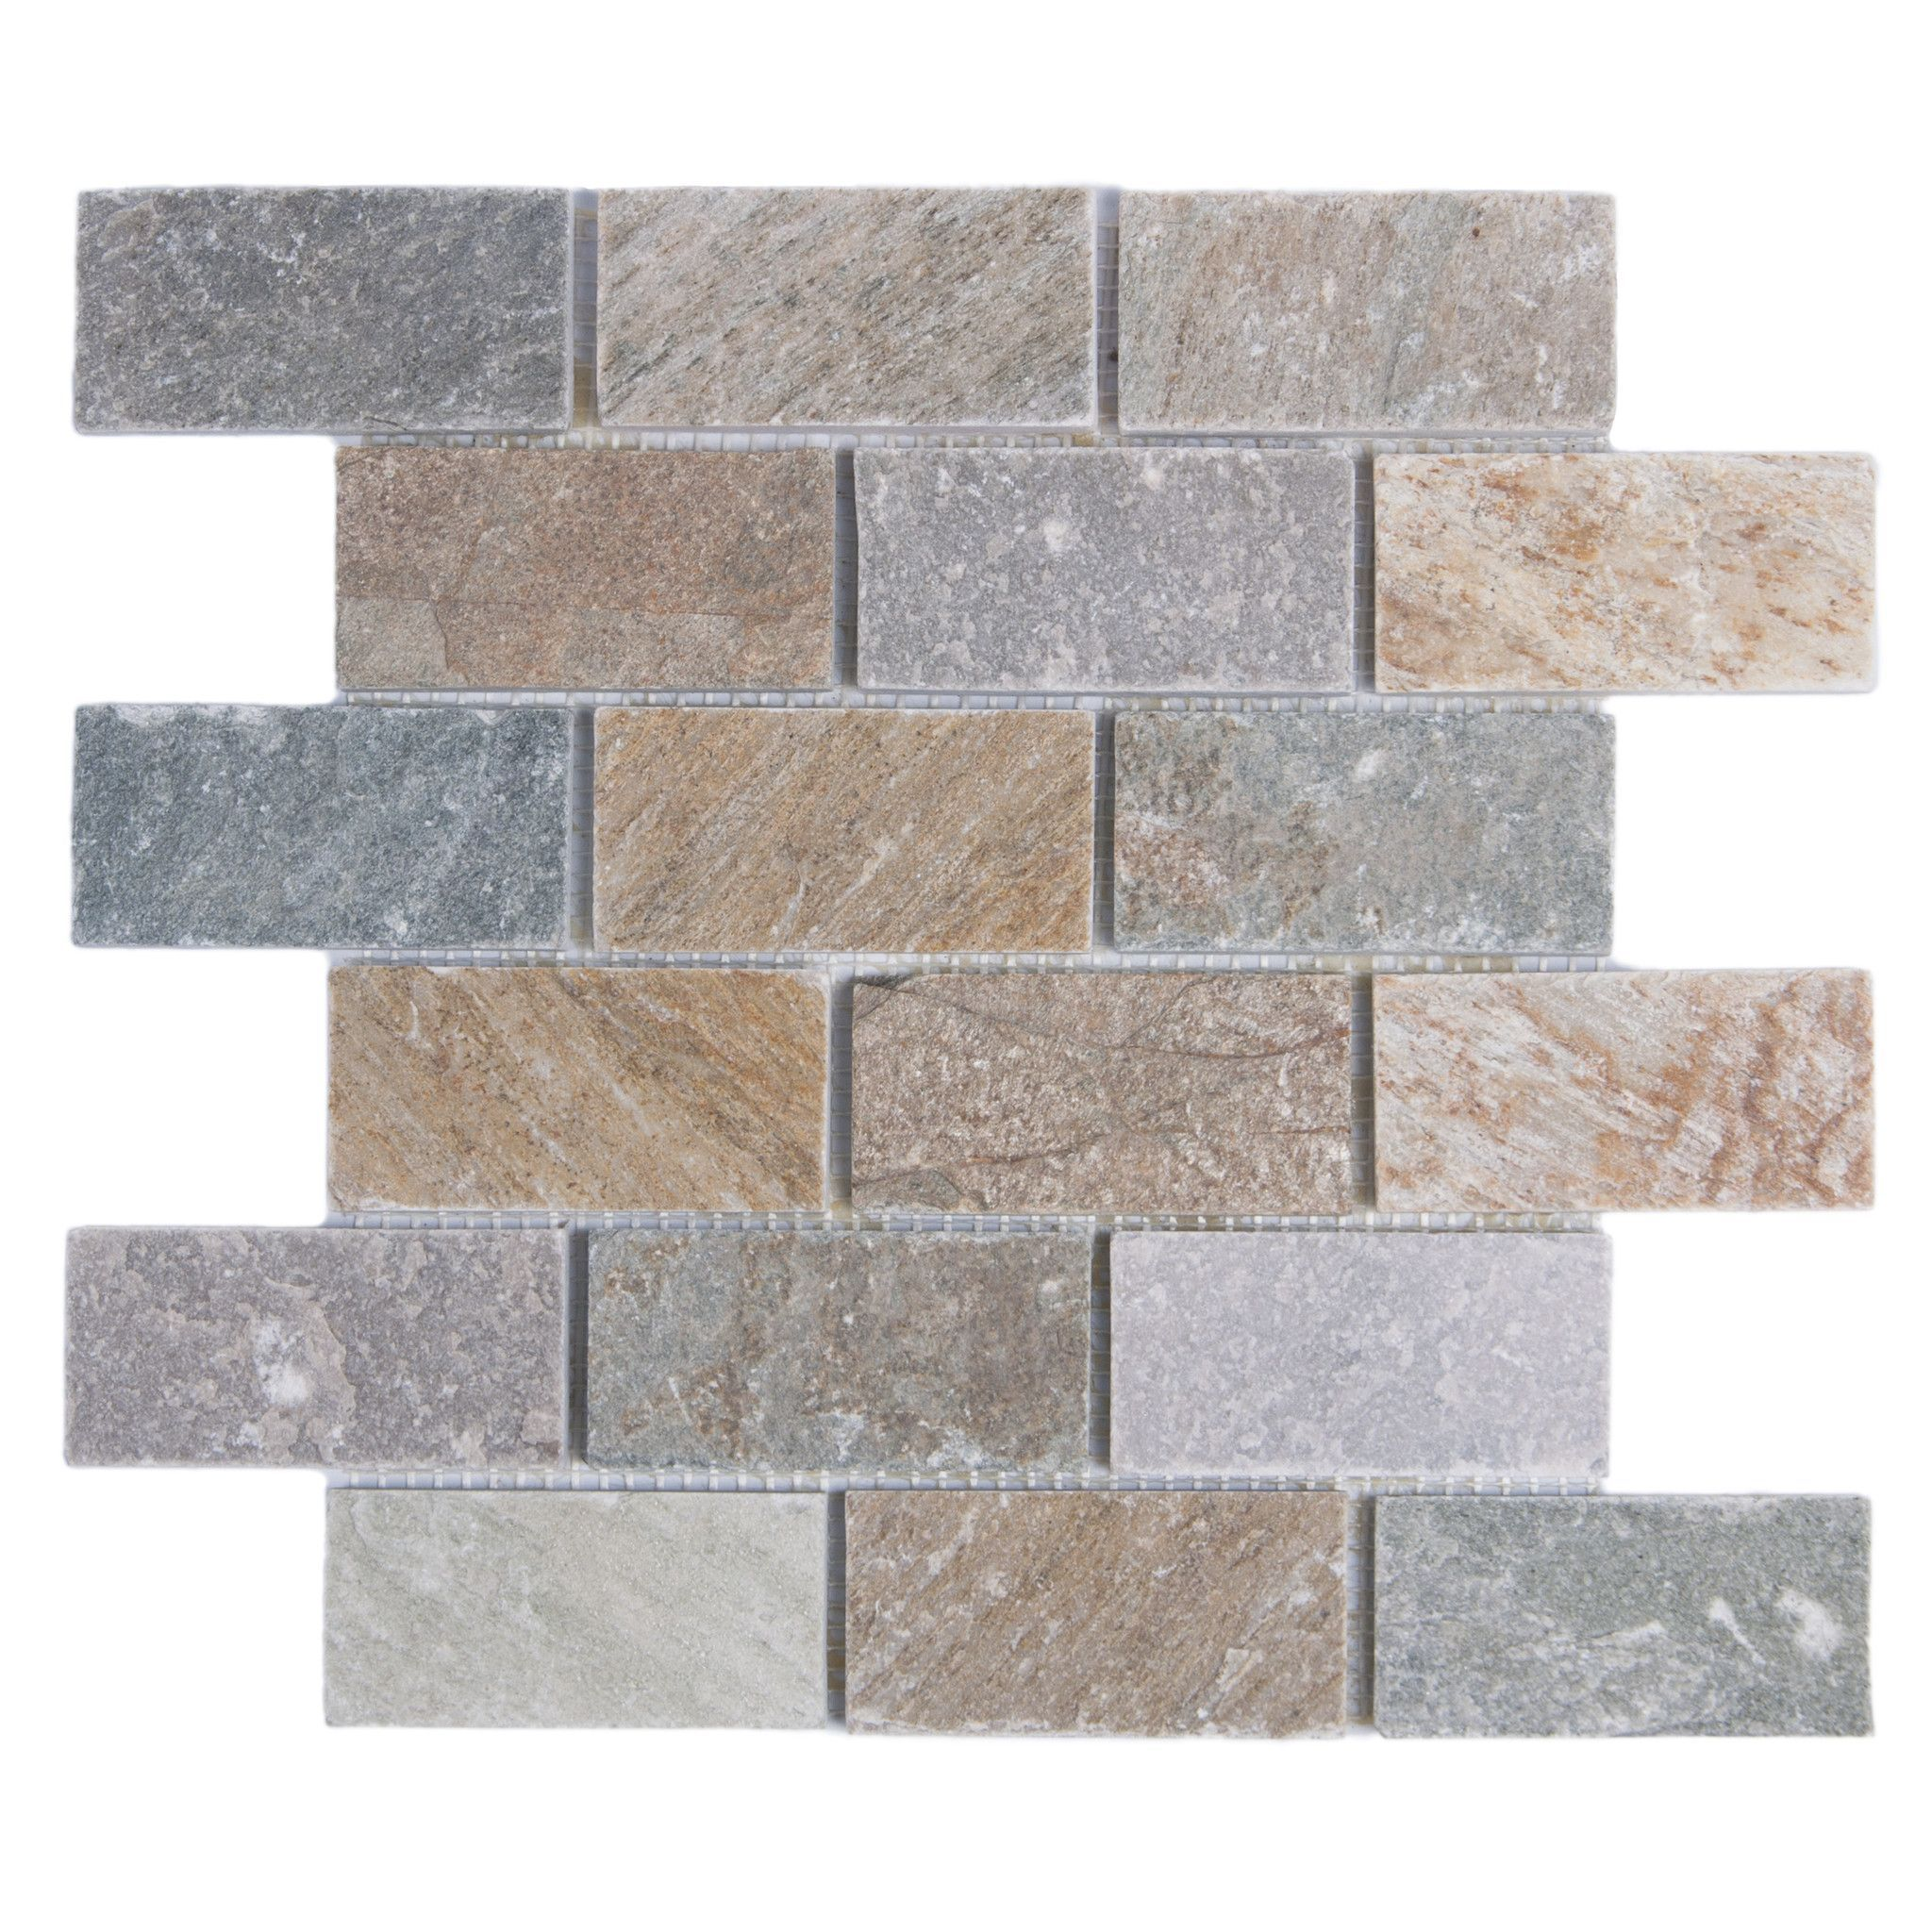 Golden Harvest Quartzite Slate Mosaic Subway Tile 2x4 Brick Pattern